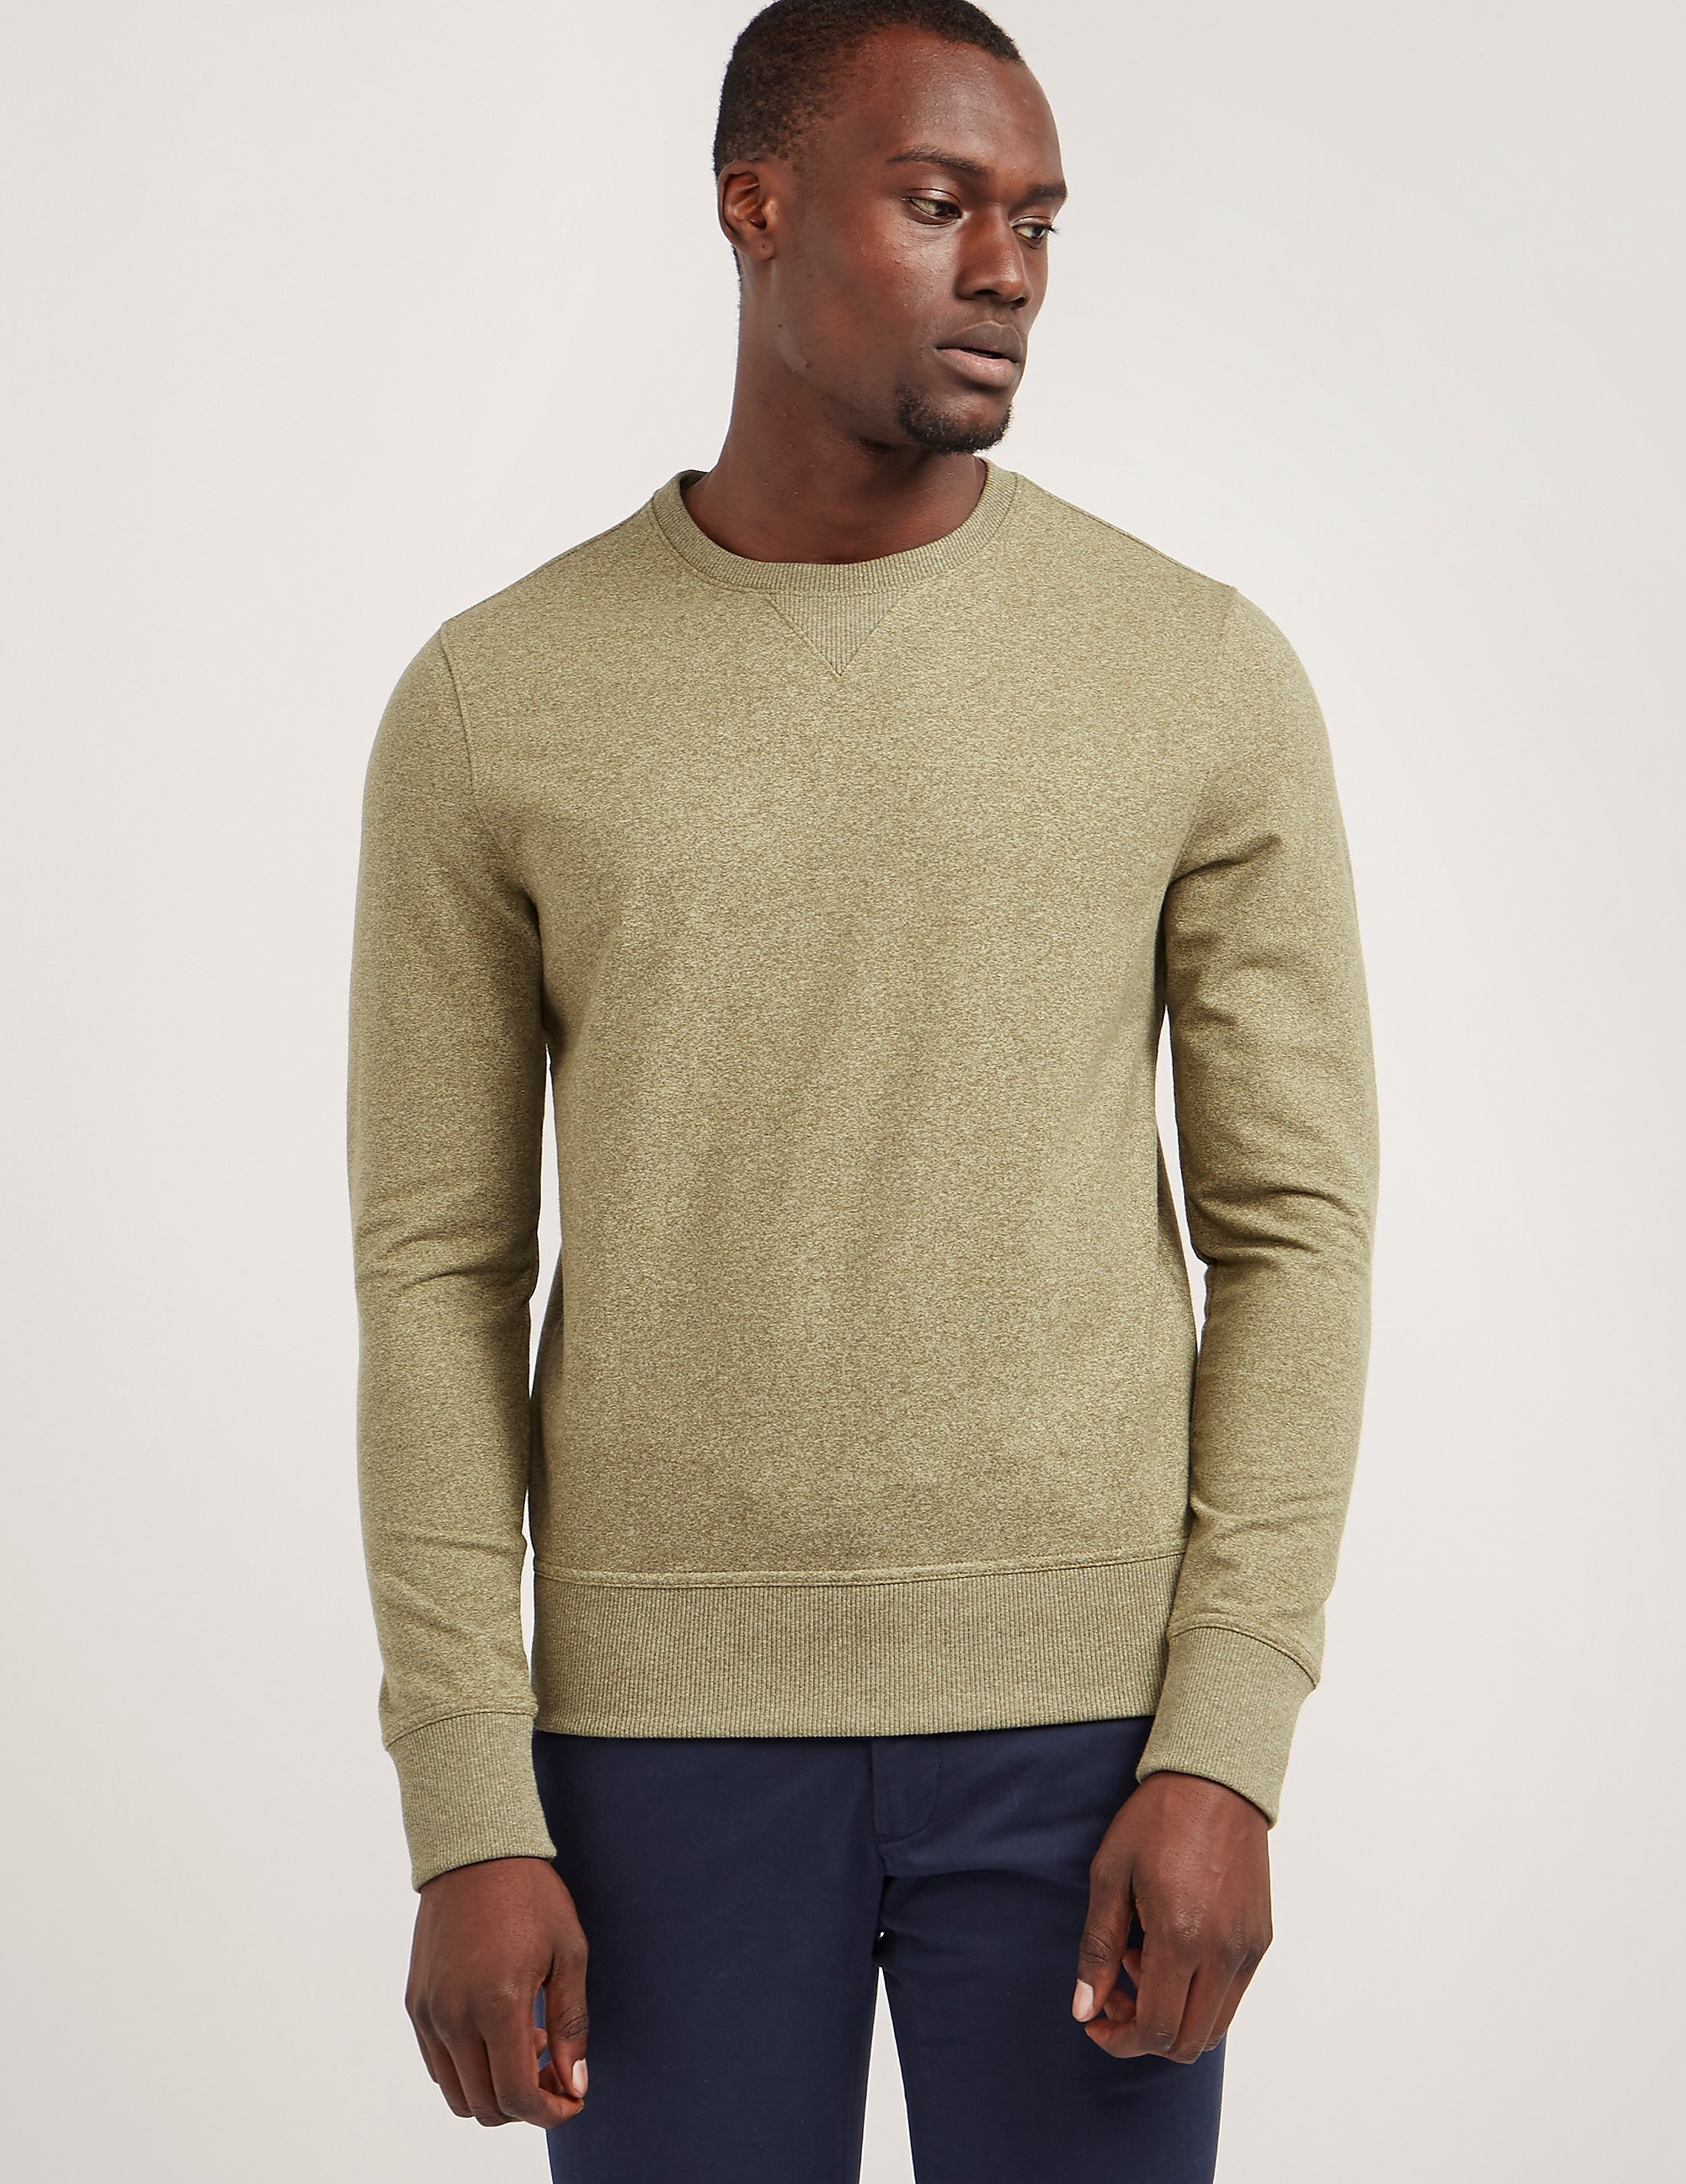 Michael Kors Crew Sweatshirt